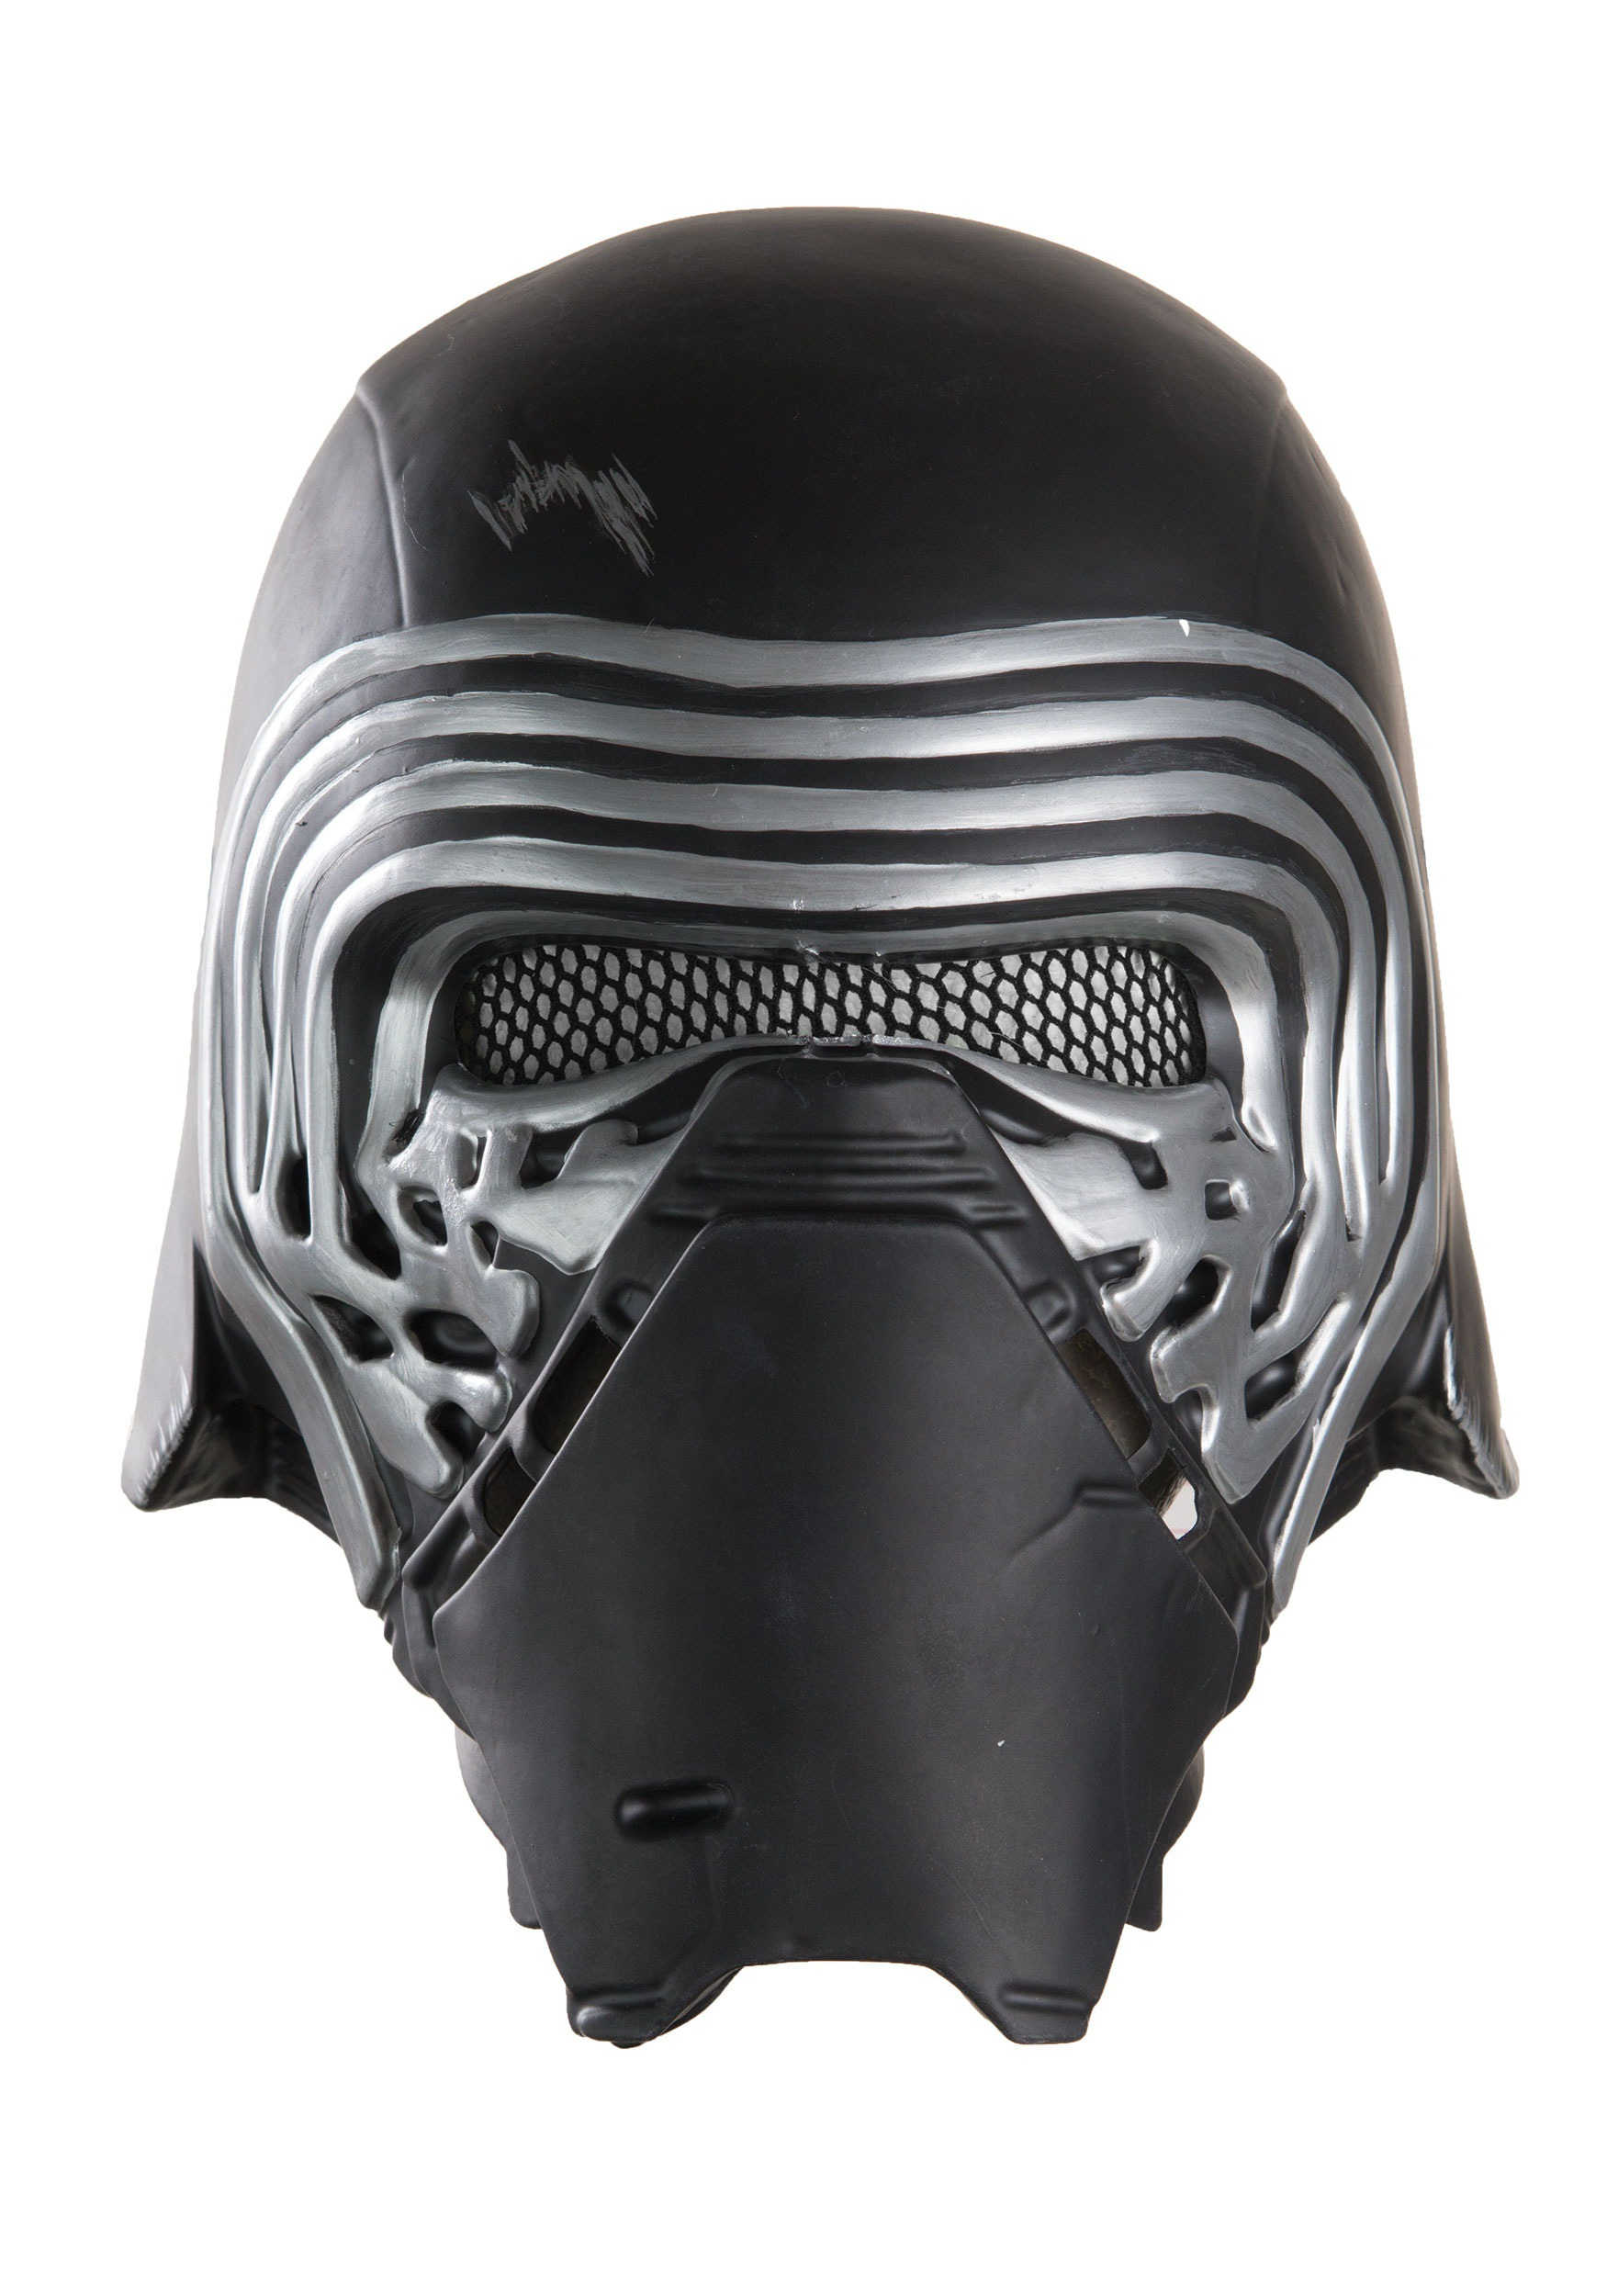 Star Wars Kylo Ren Helmet RU32263